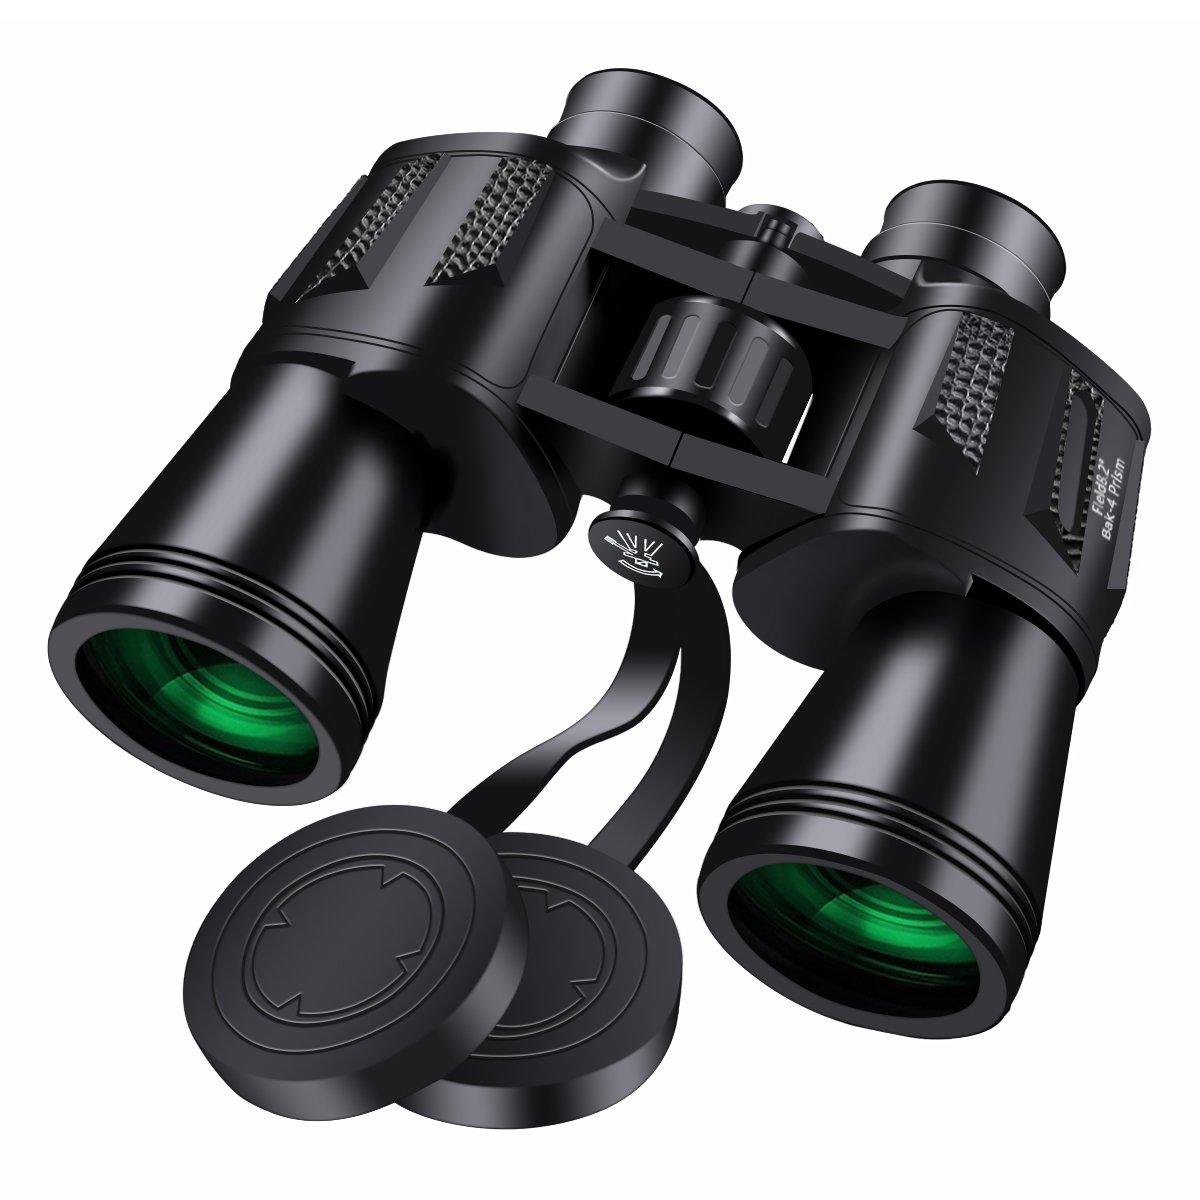 Binoculares 10 x 50, SGODDE Binoculares de Ampliación, Zoom Impermeable Ultra HD FM para la Observación de Aves Paisaje de Caza de Fútbol con Tragetasche ...